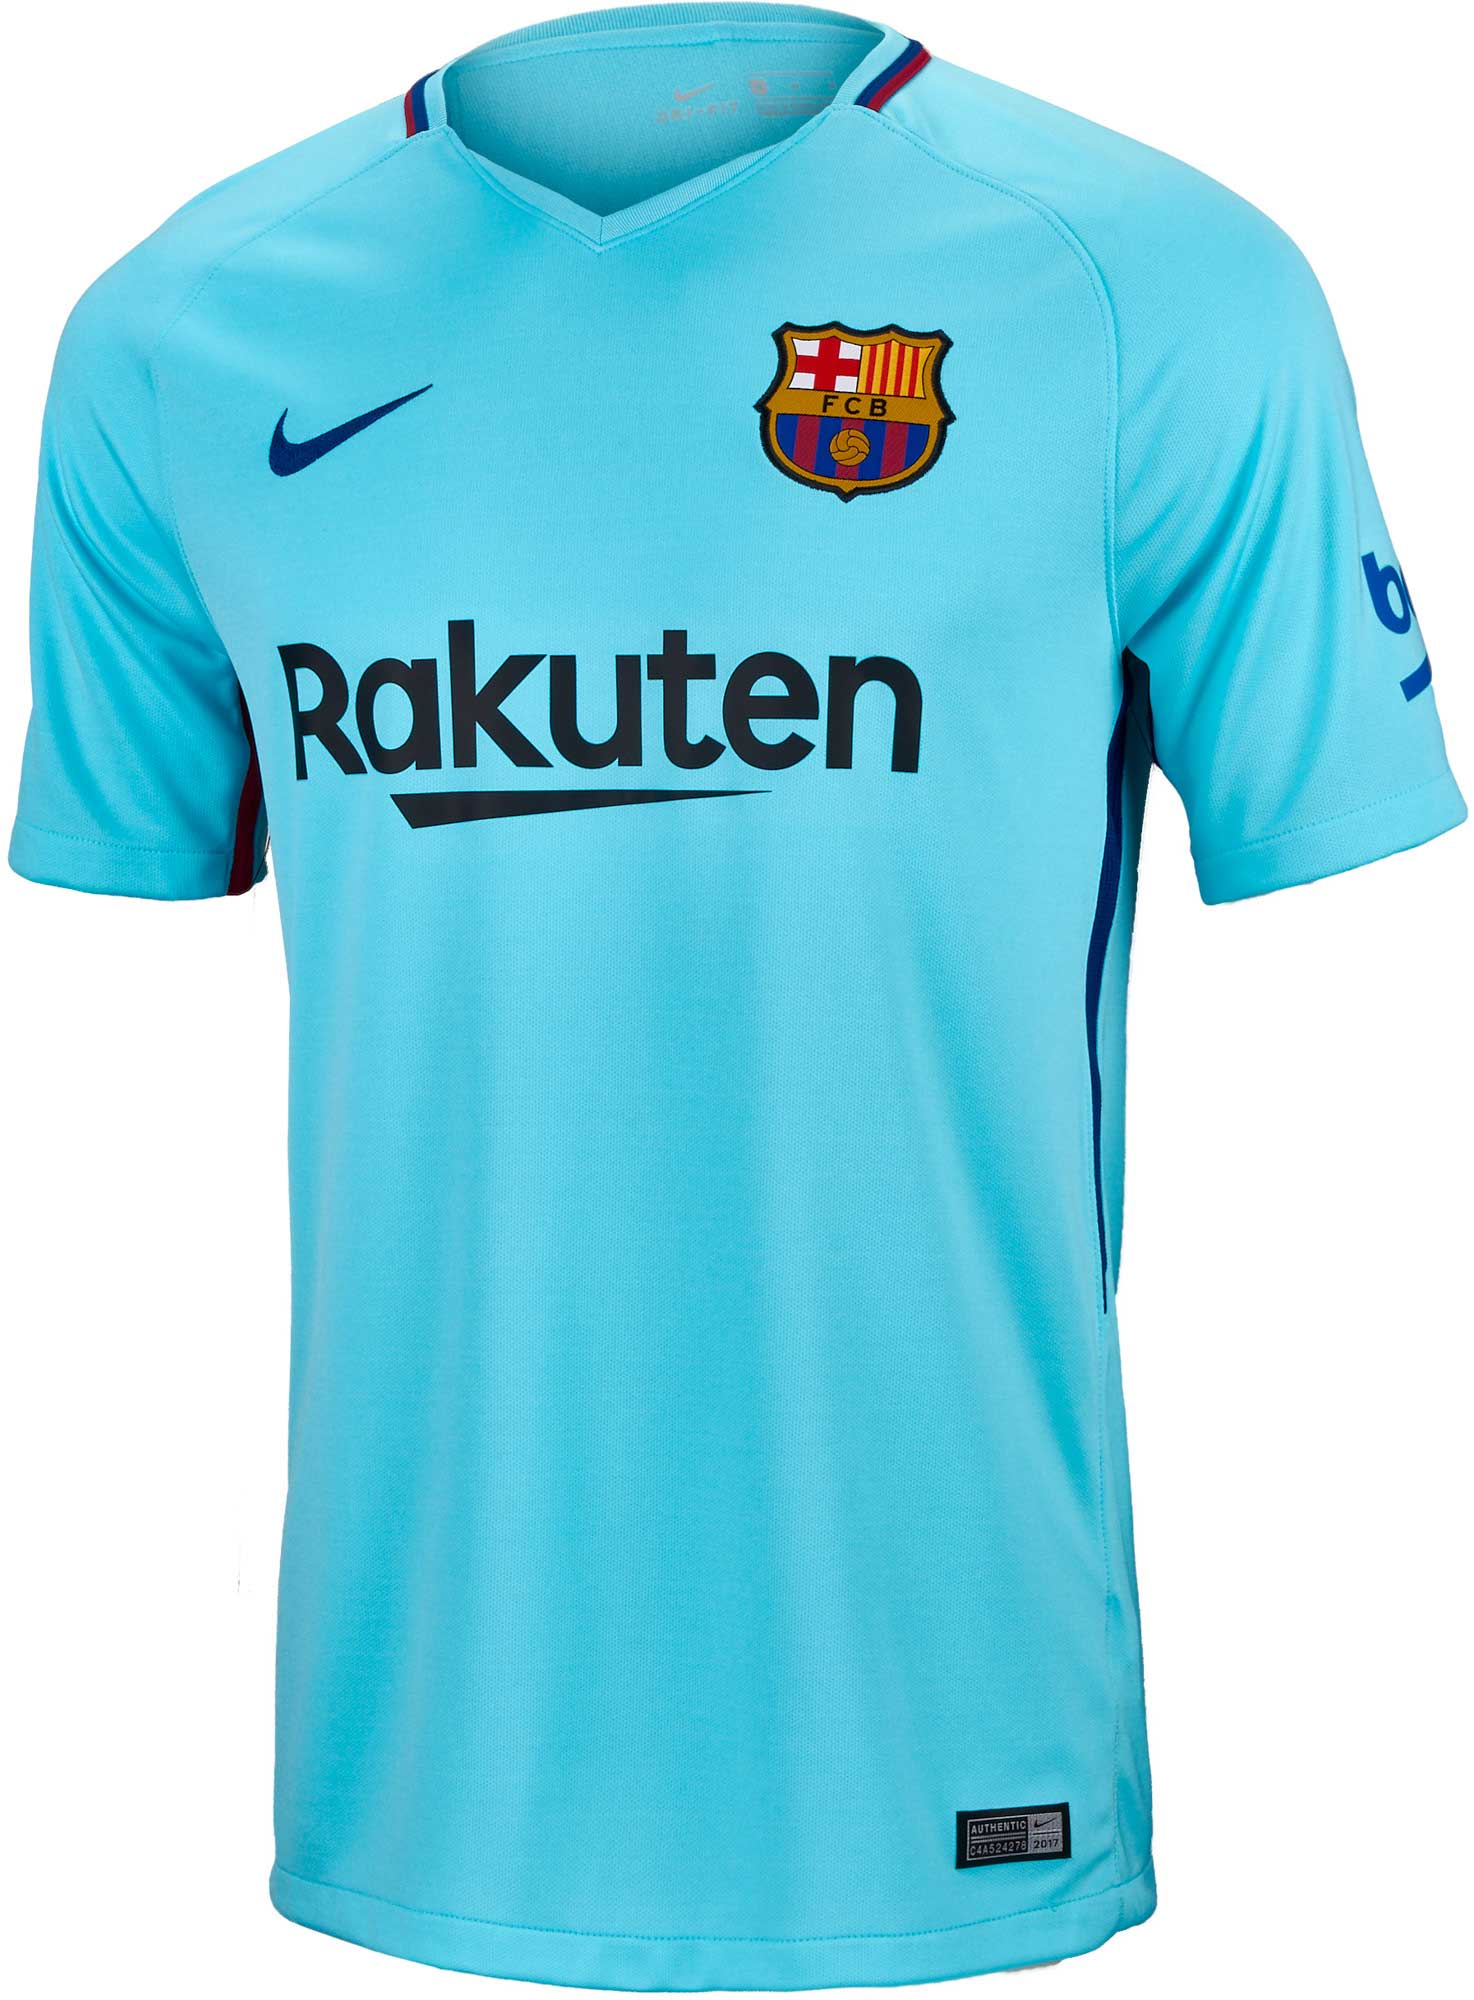 Nike Barcelona Away Jersey 2017 18 Barcelona Jerseys